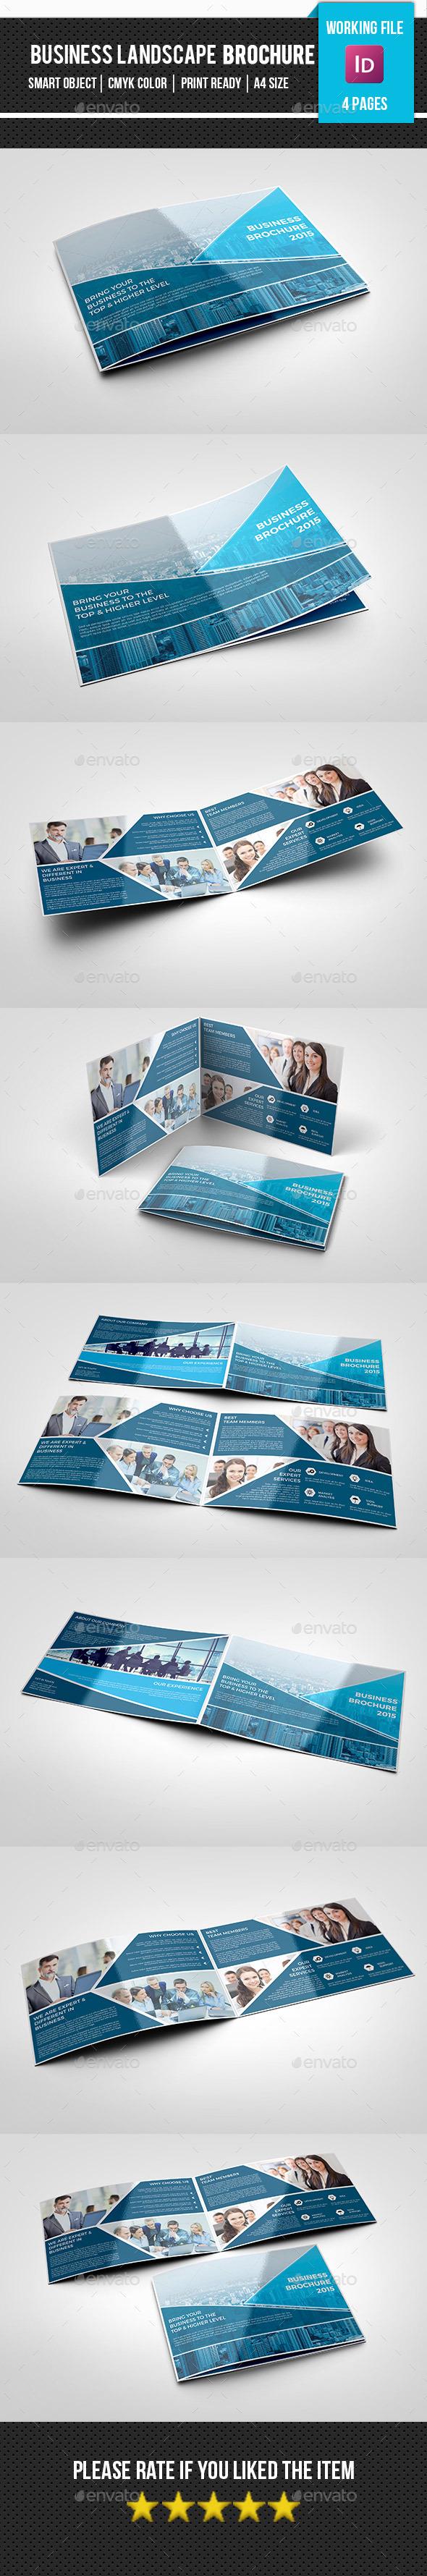 Corporate Brochure Template-V268 - Corporate Brochures